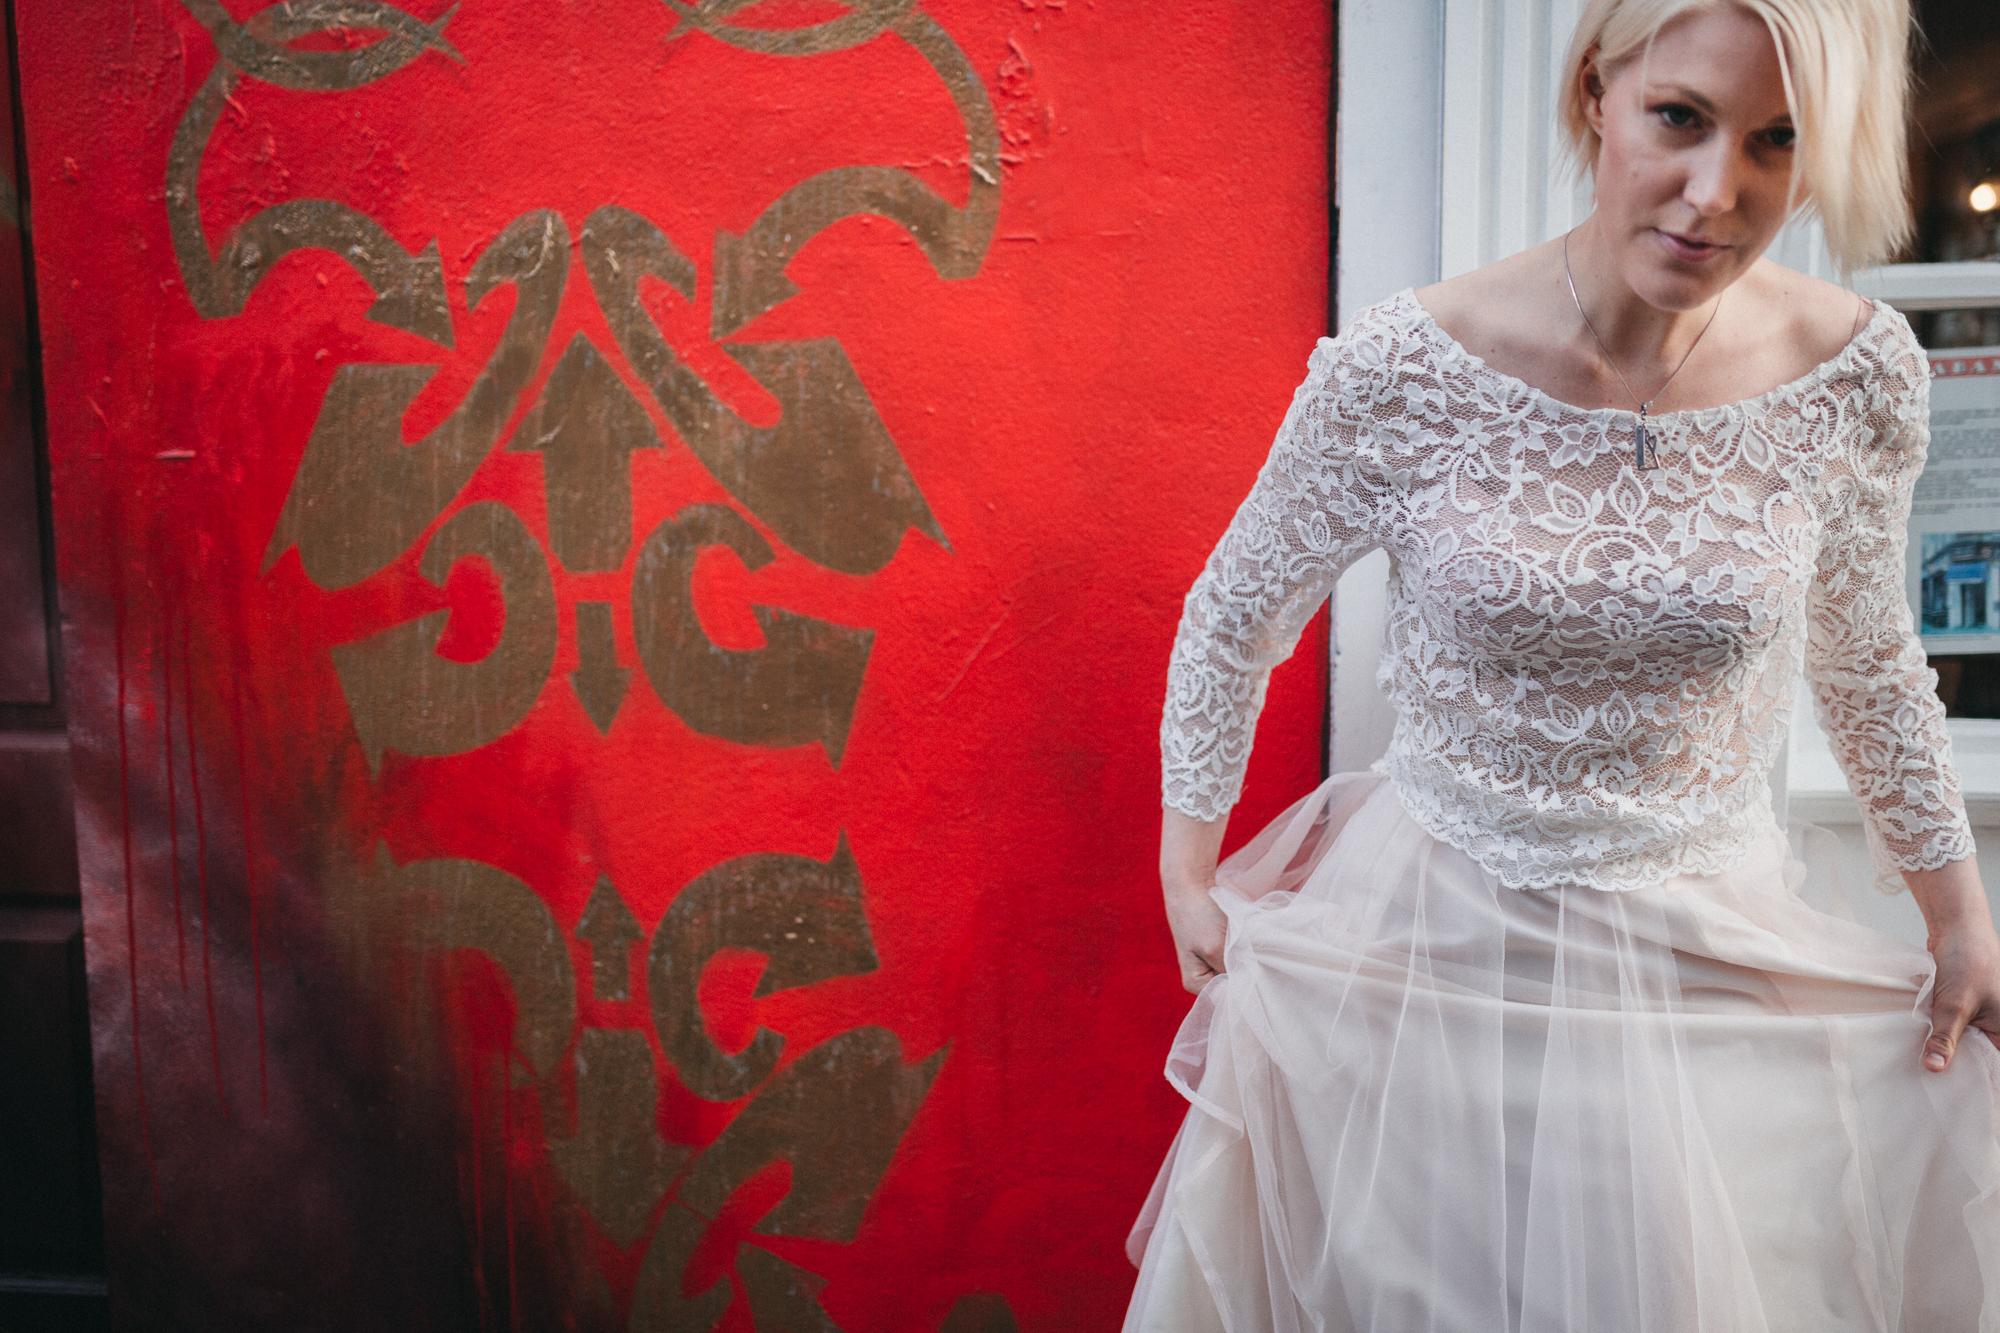 weddingphotographer_lindarehlin_preweddingphoto_london_SensibleM-105.jpg